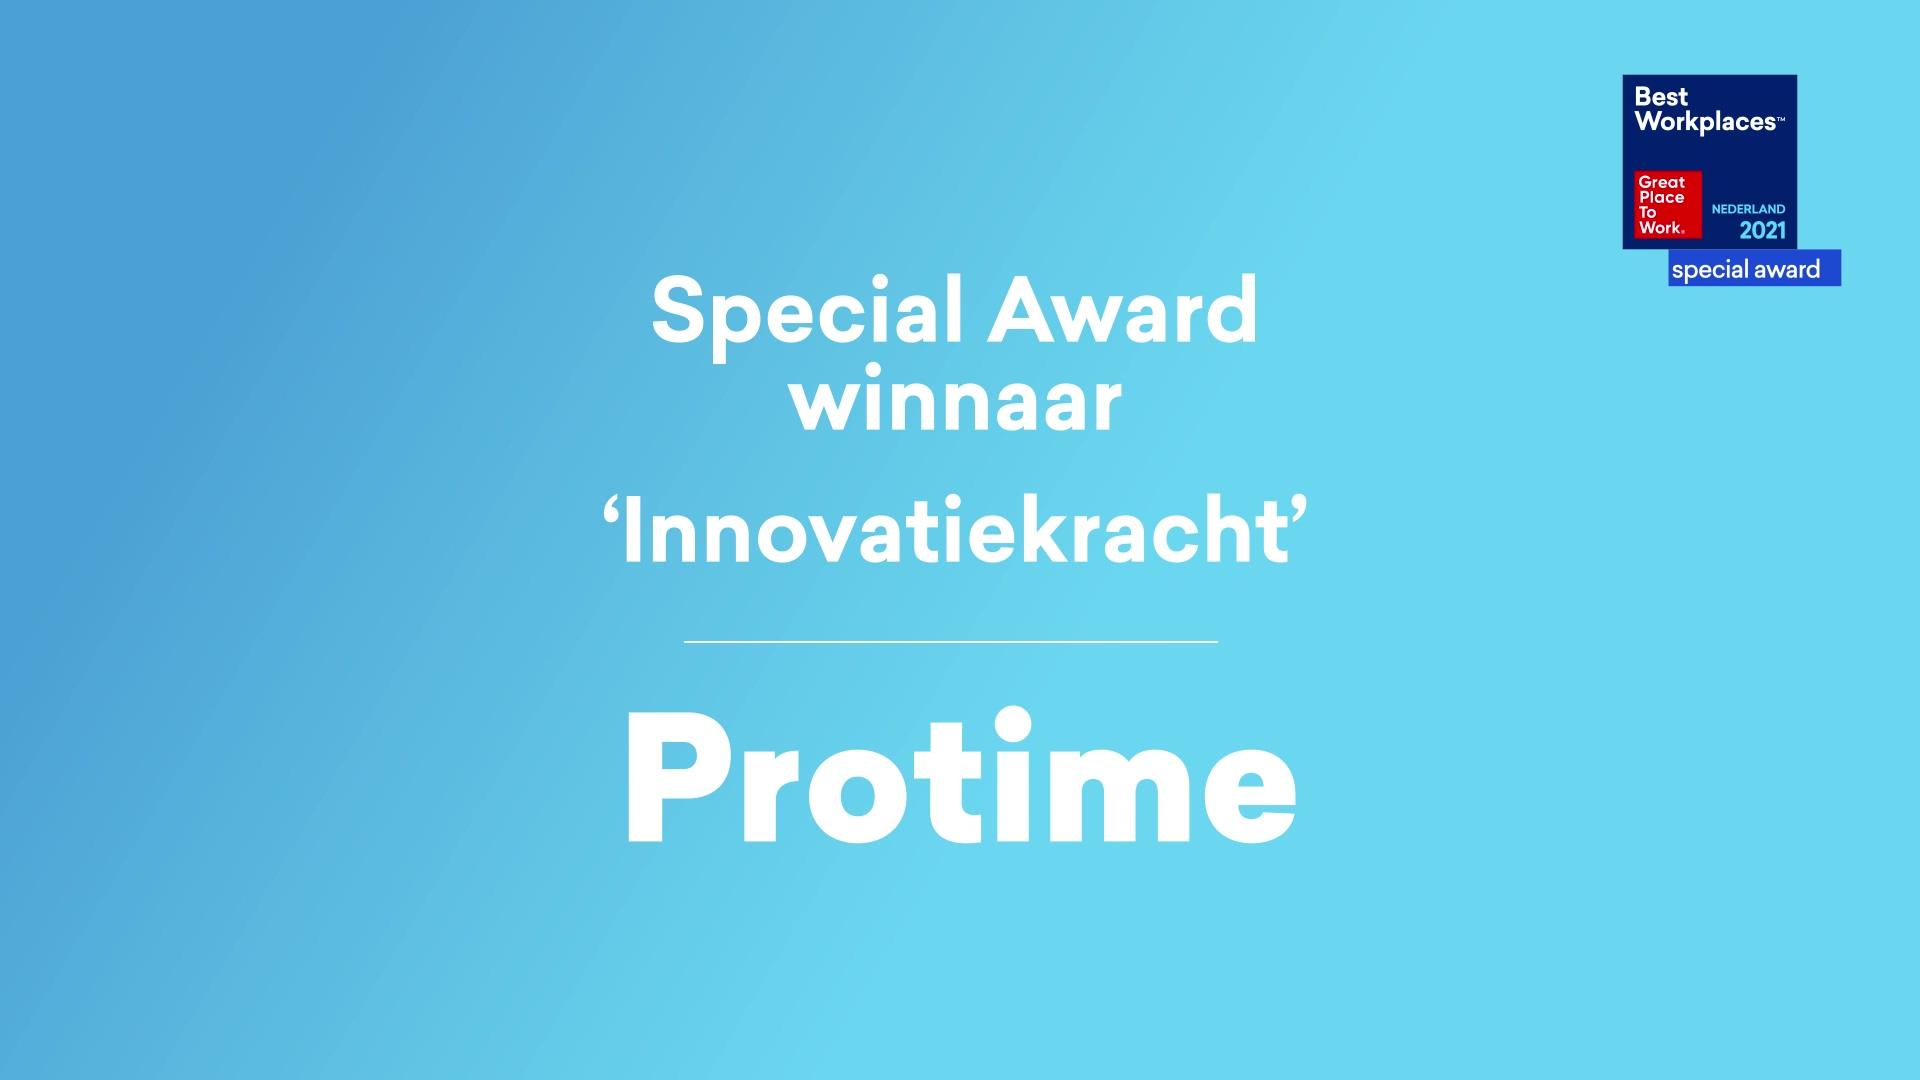 Protime_Special Award winnaar Innovatiekracht